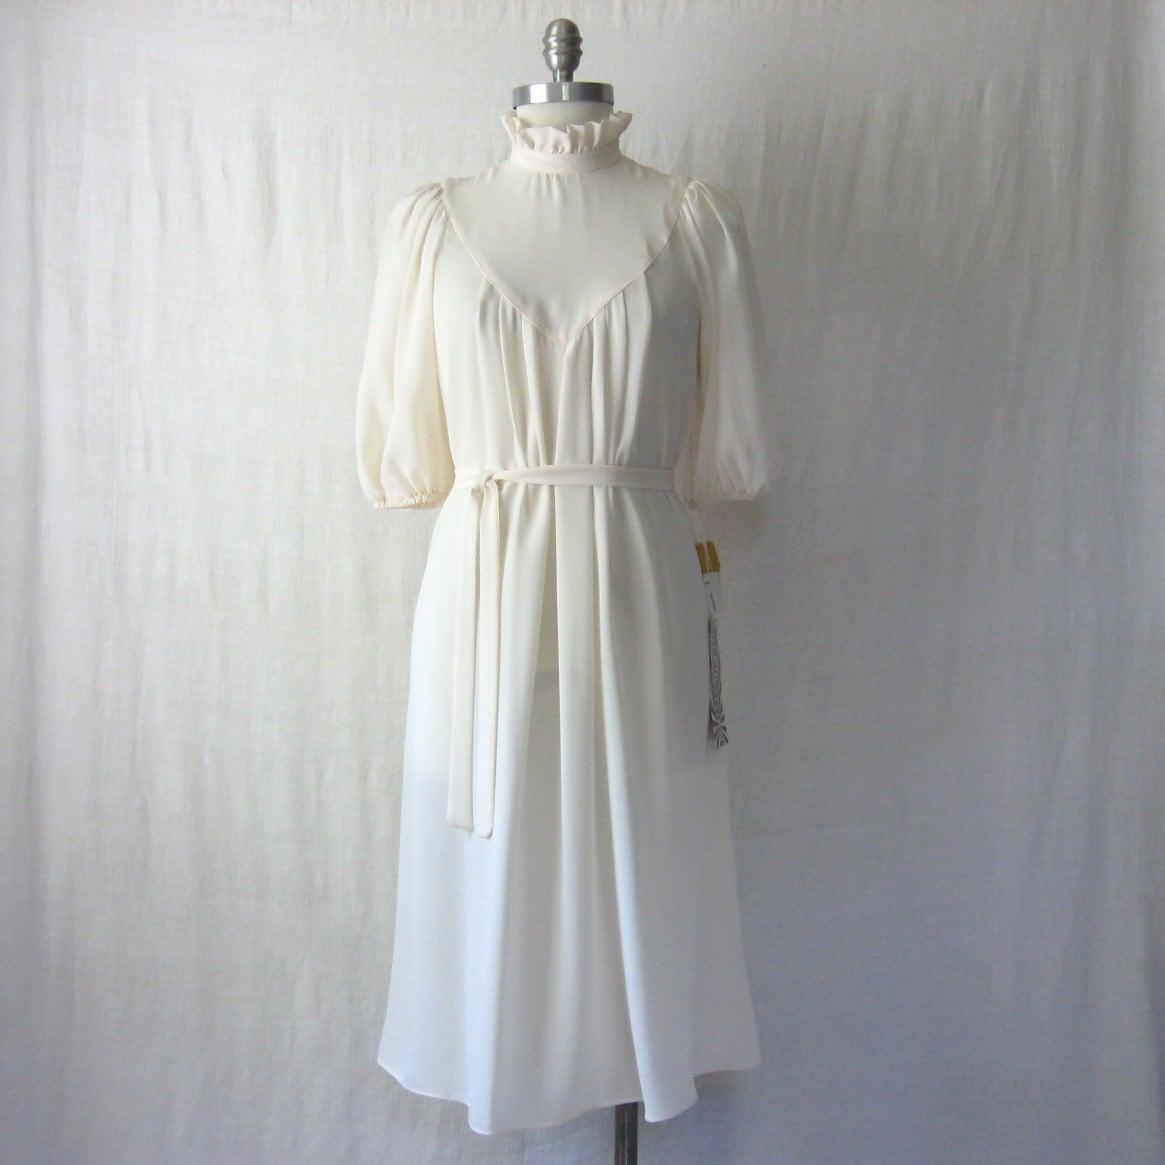 1970s NOS Dress Boho Wedding Dress Victorian Revival Ruffle